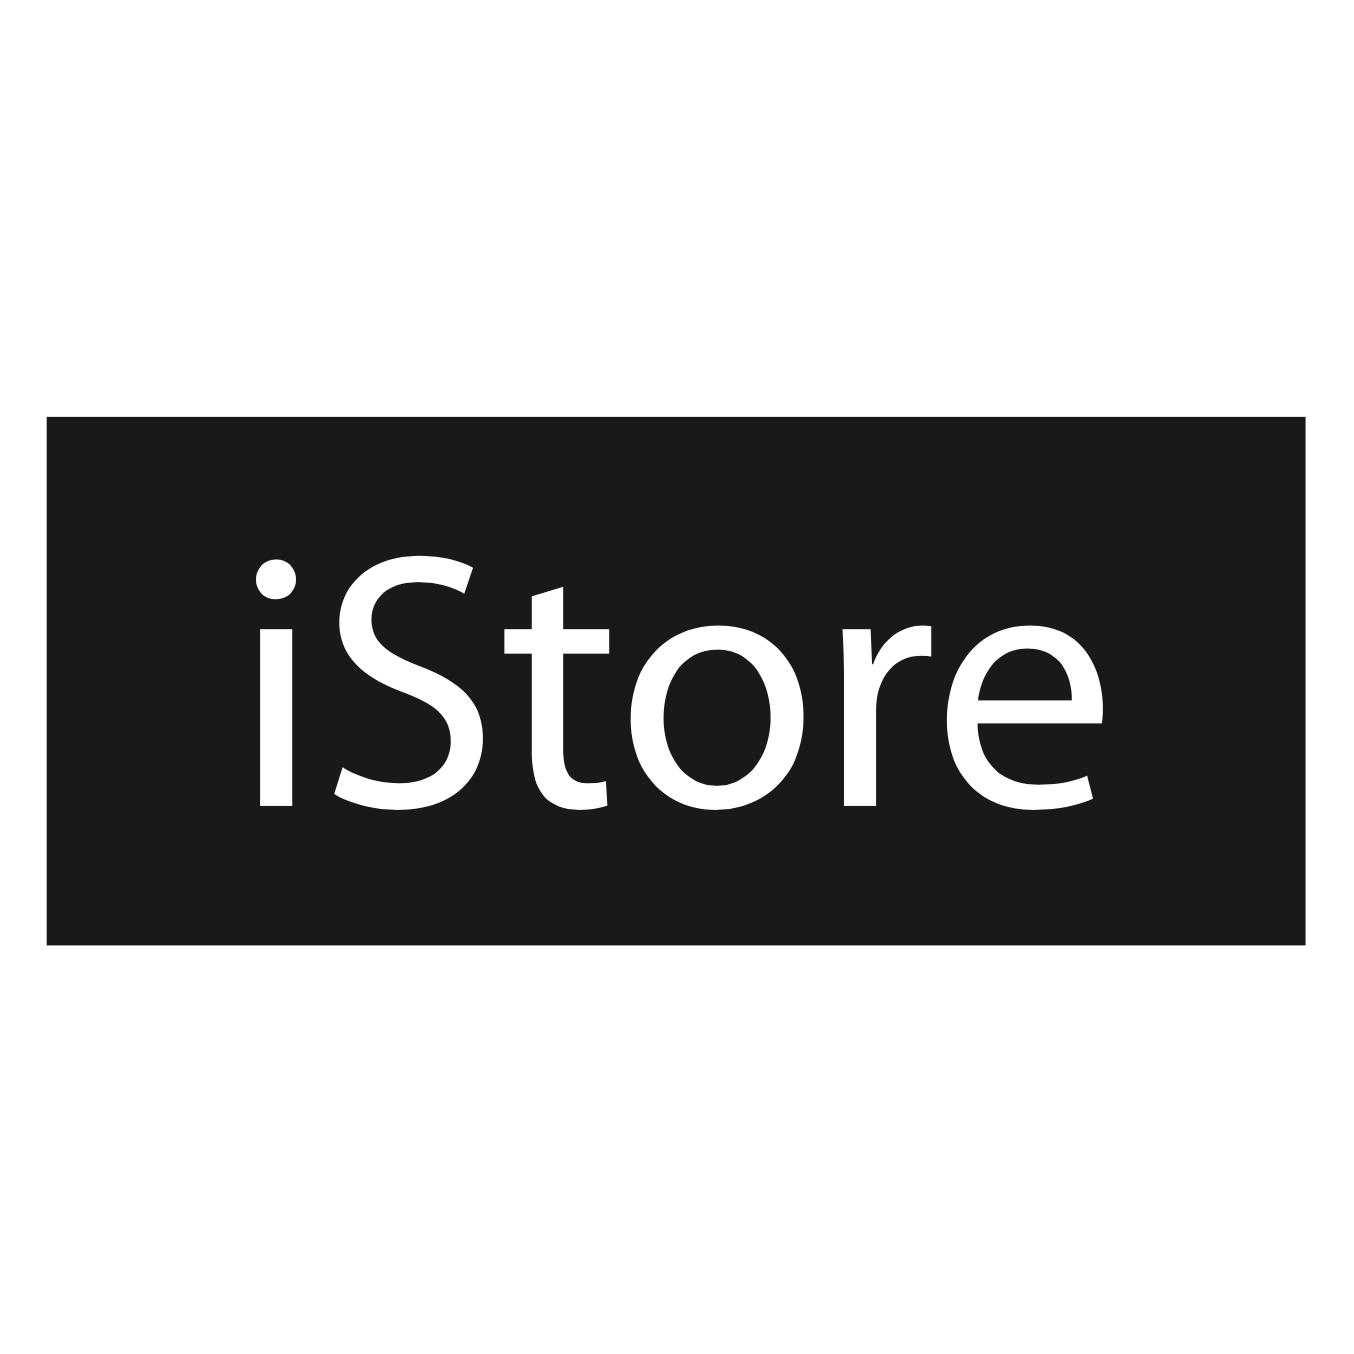 iPhone SE 256GB - White